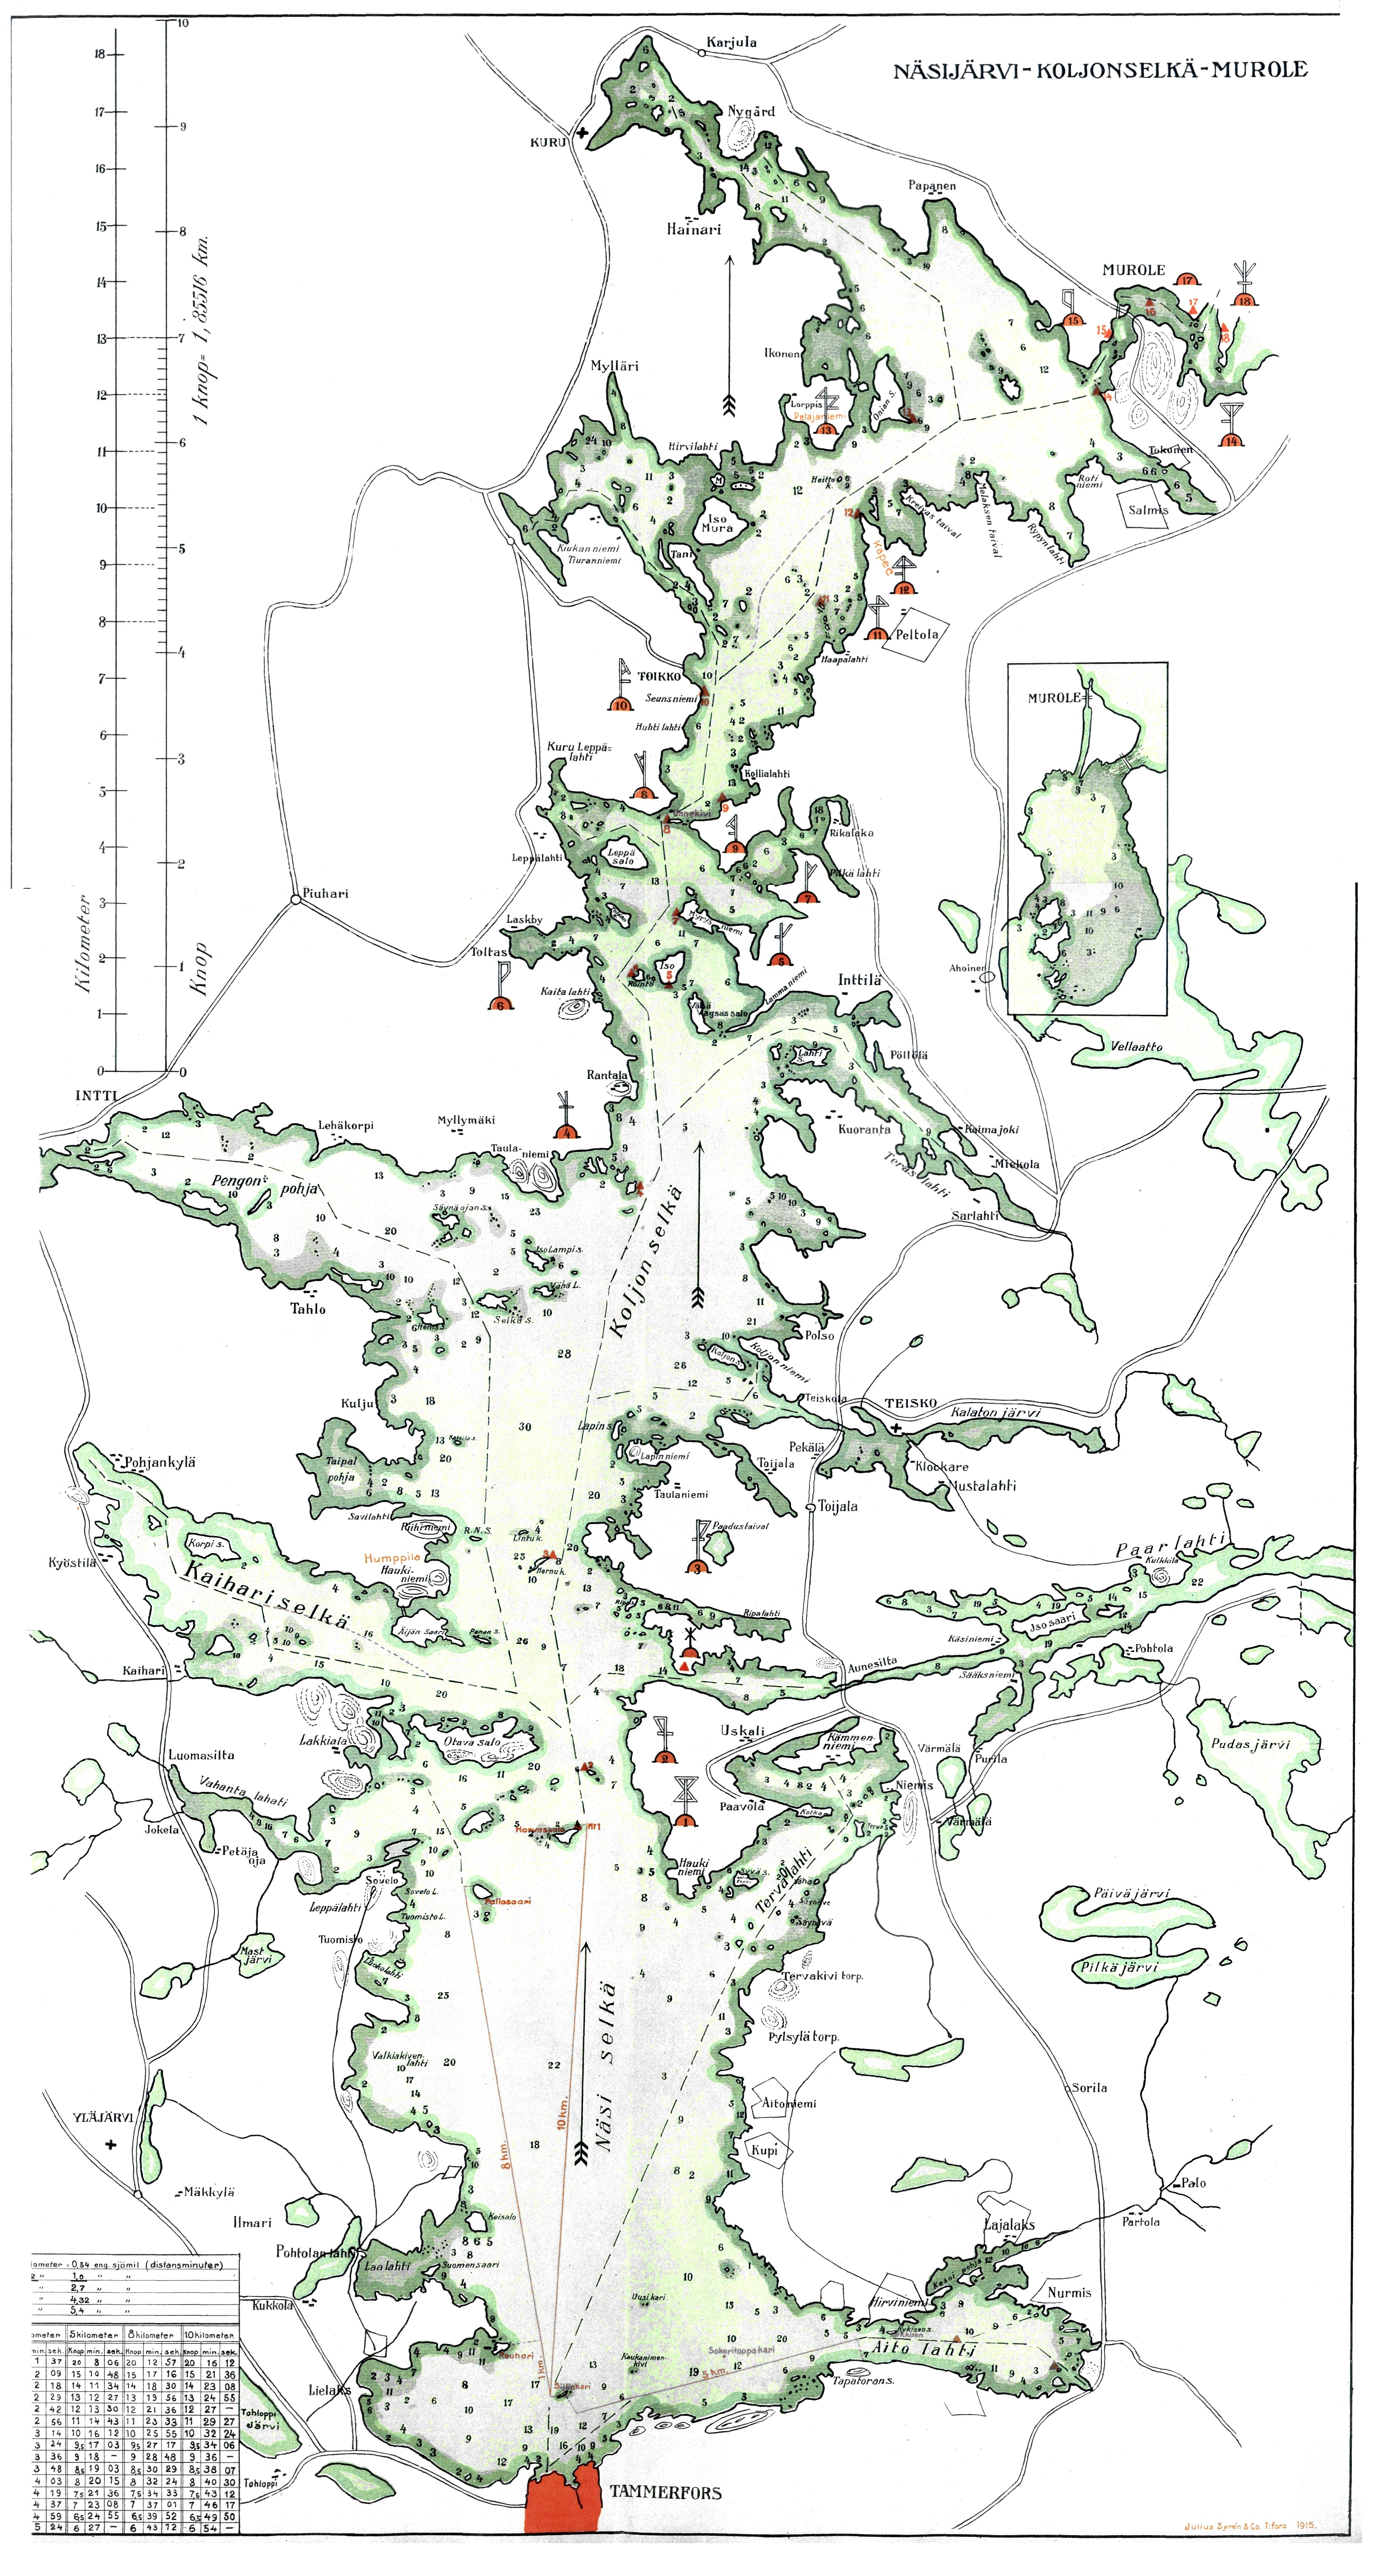 Index Of Kartat Vesistokartat